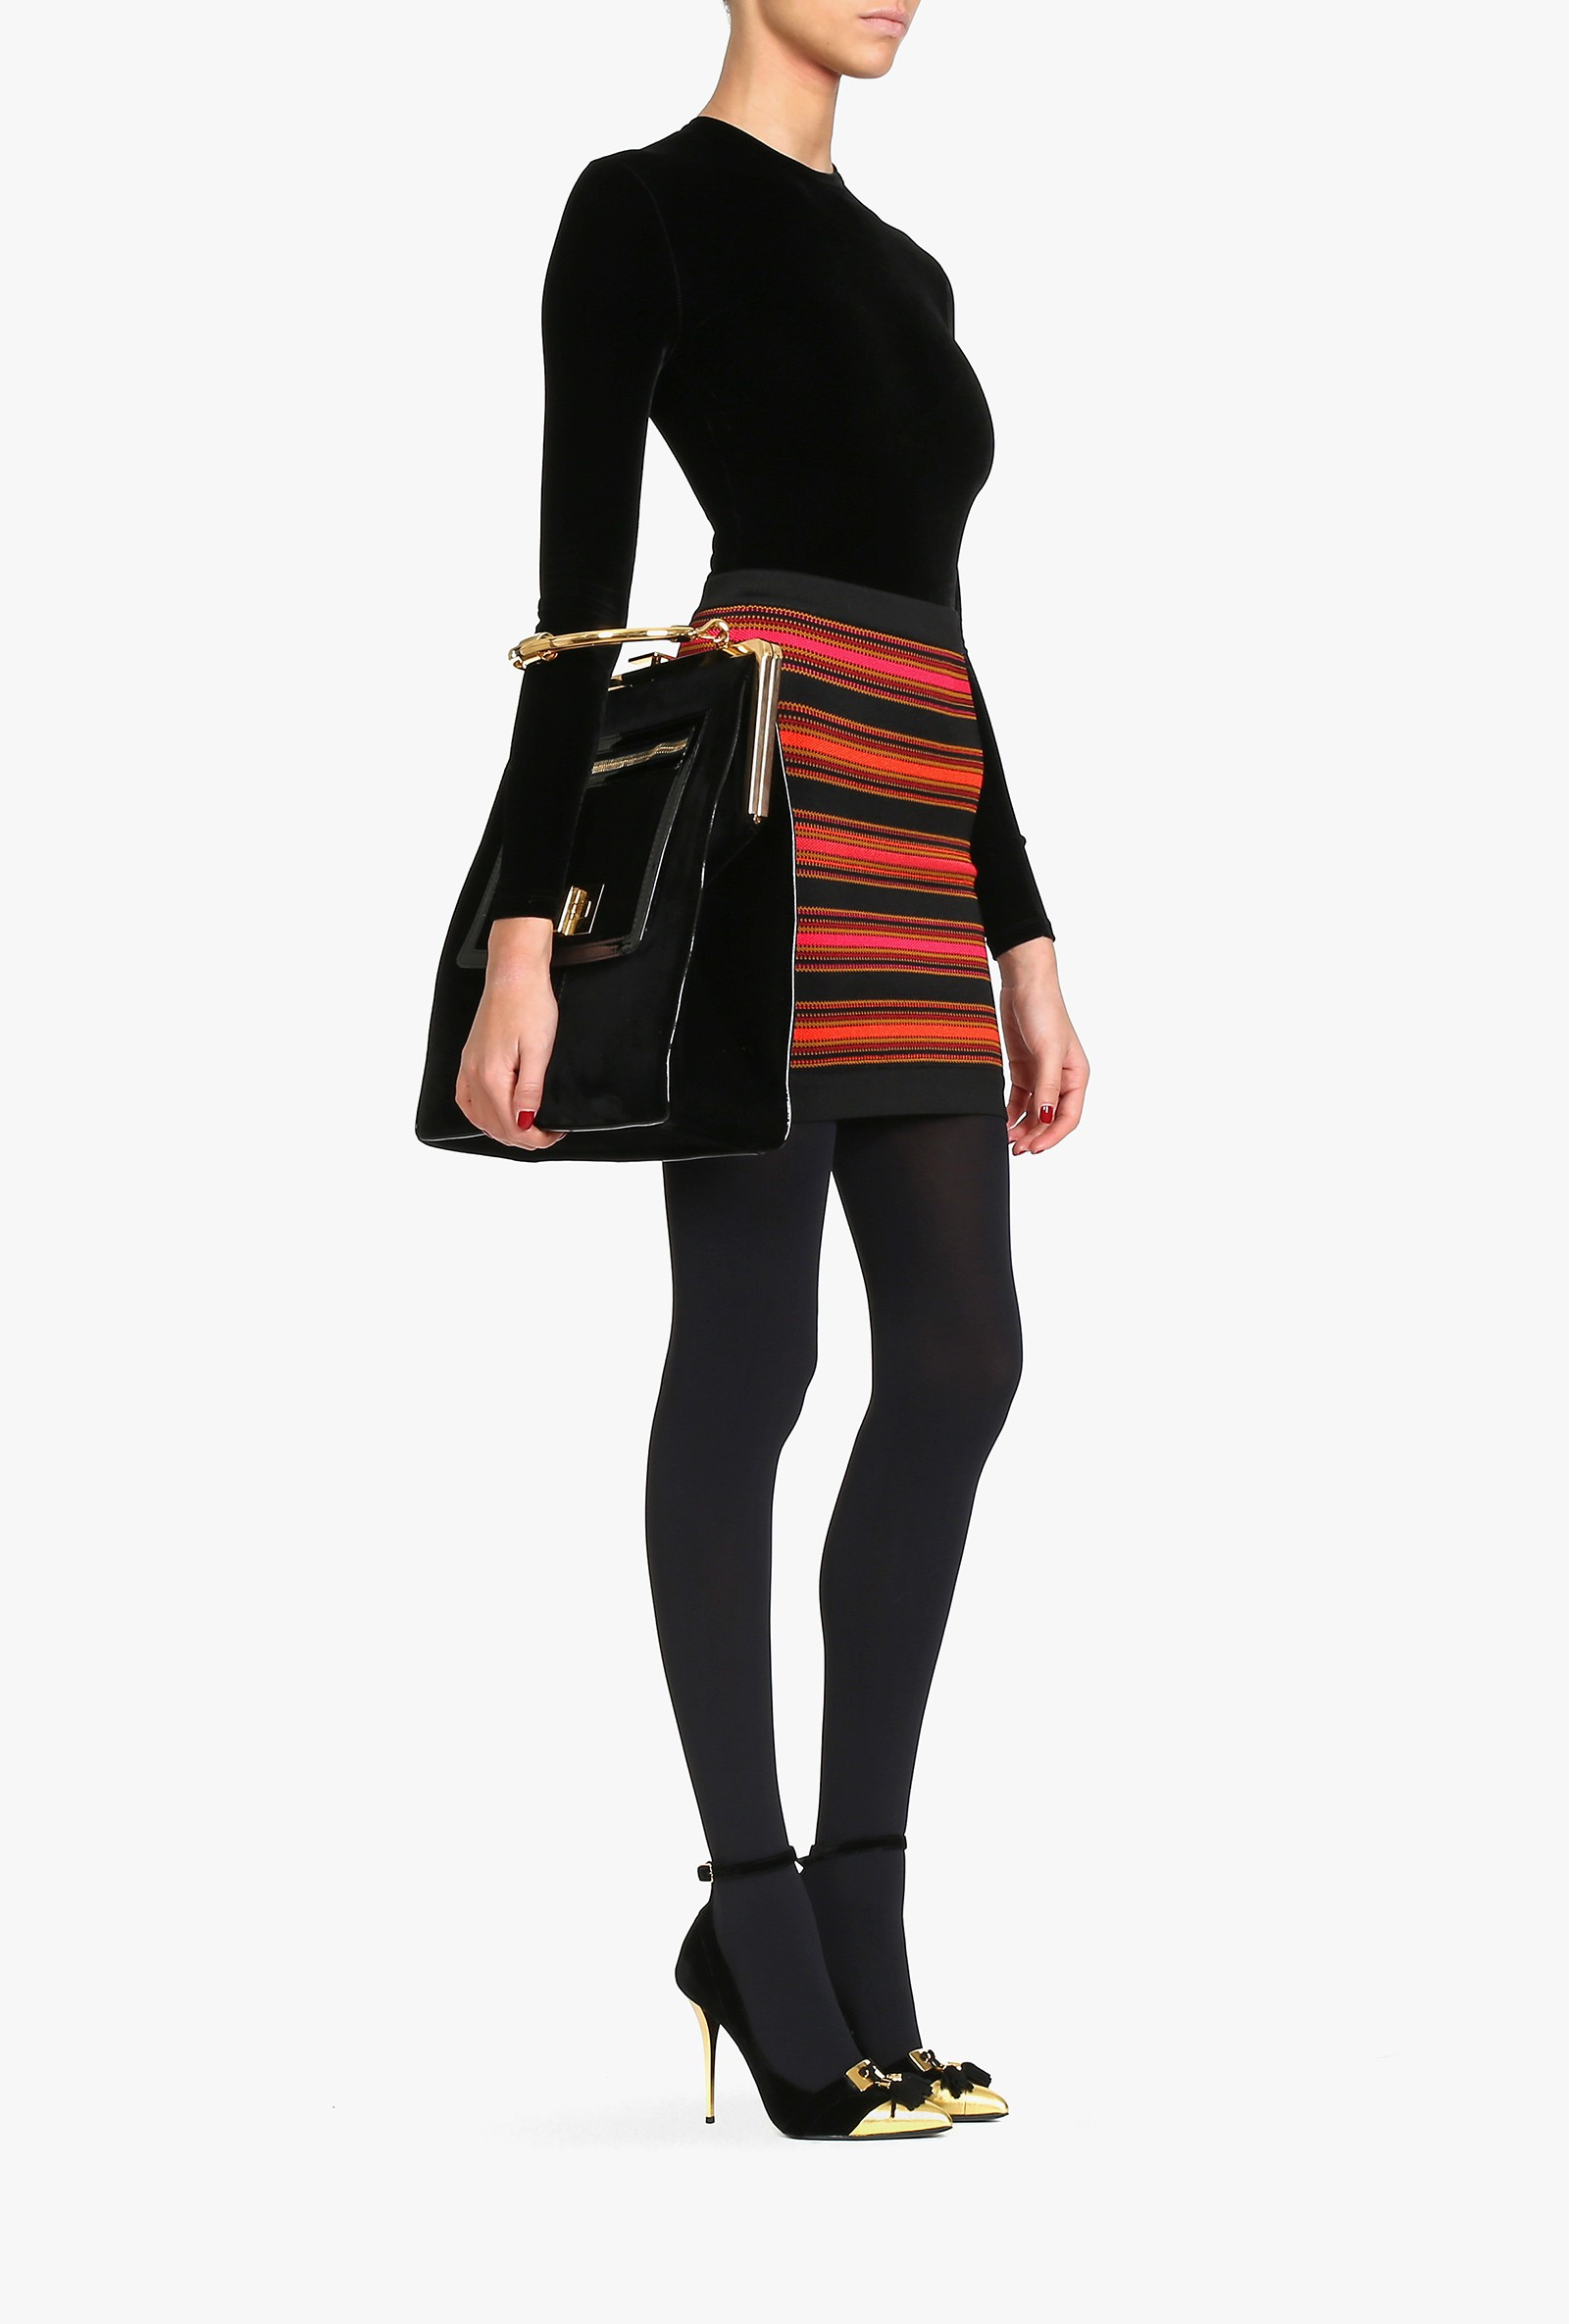 Striped stretch-knit mini skirt - Women's knit skirts